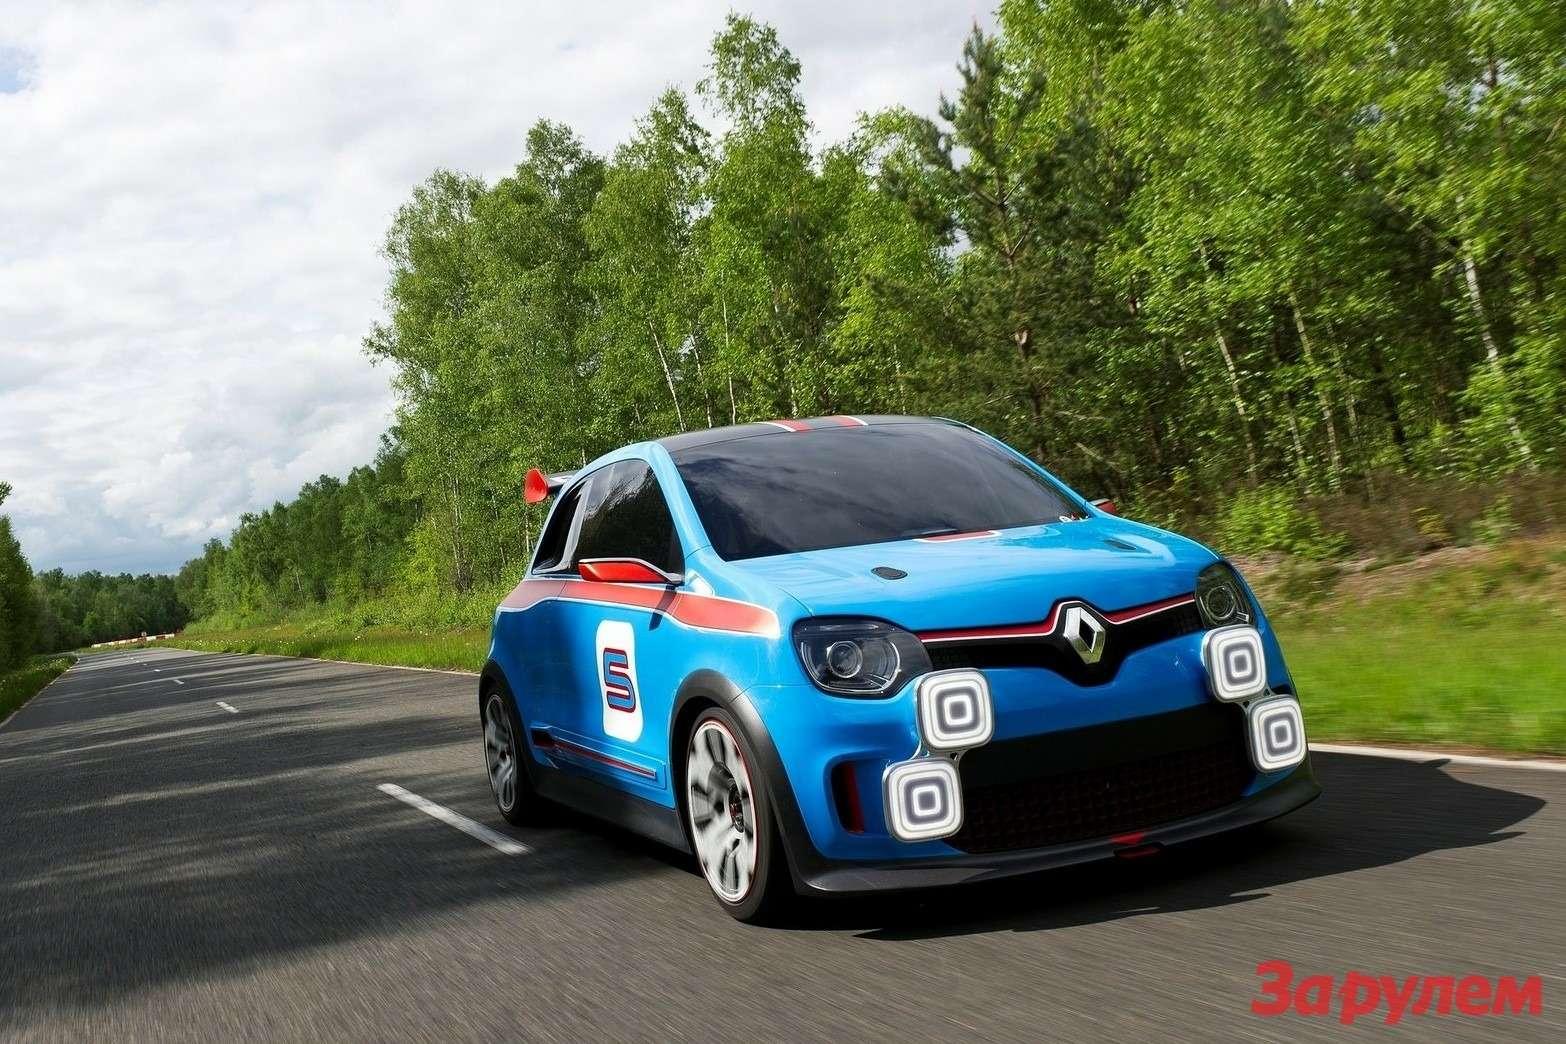 Renault Twin Run Concept 2013 1600x1200 wallpaper 06